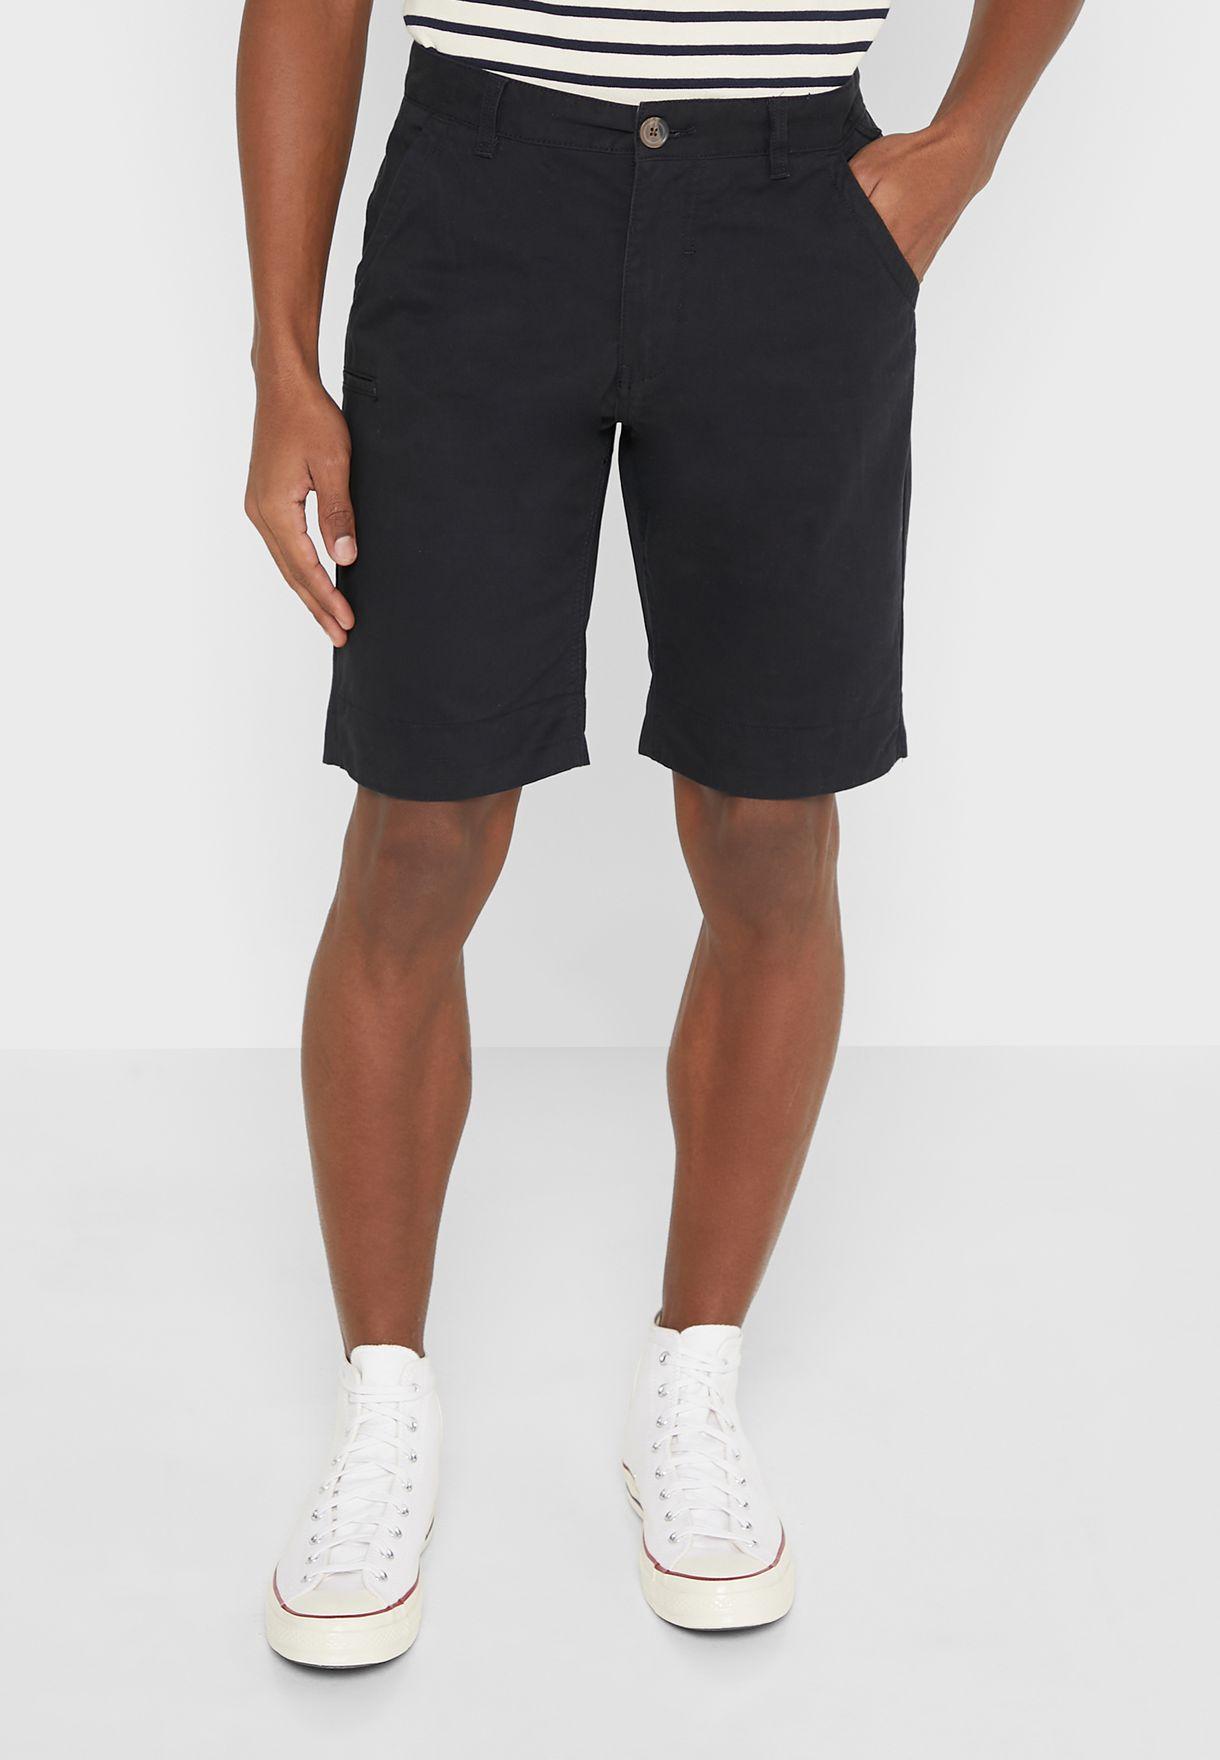 Turn Up Legs Shorts